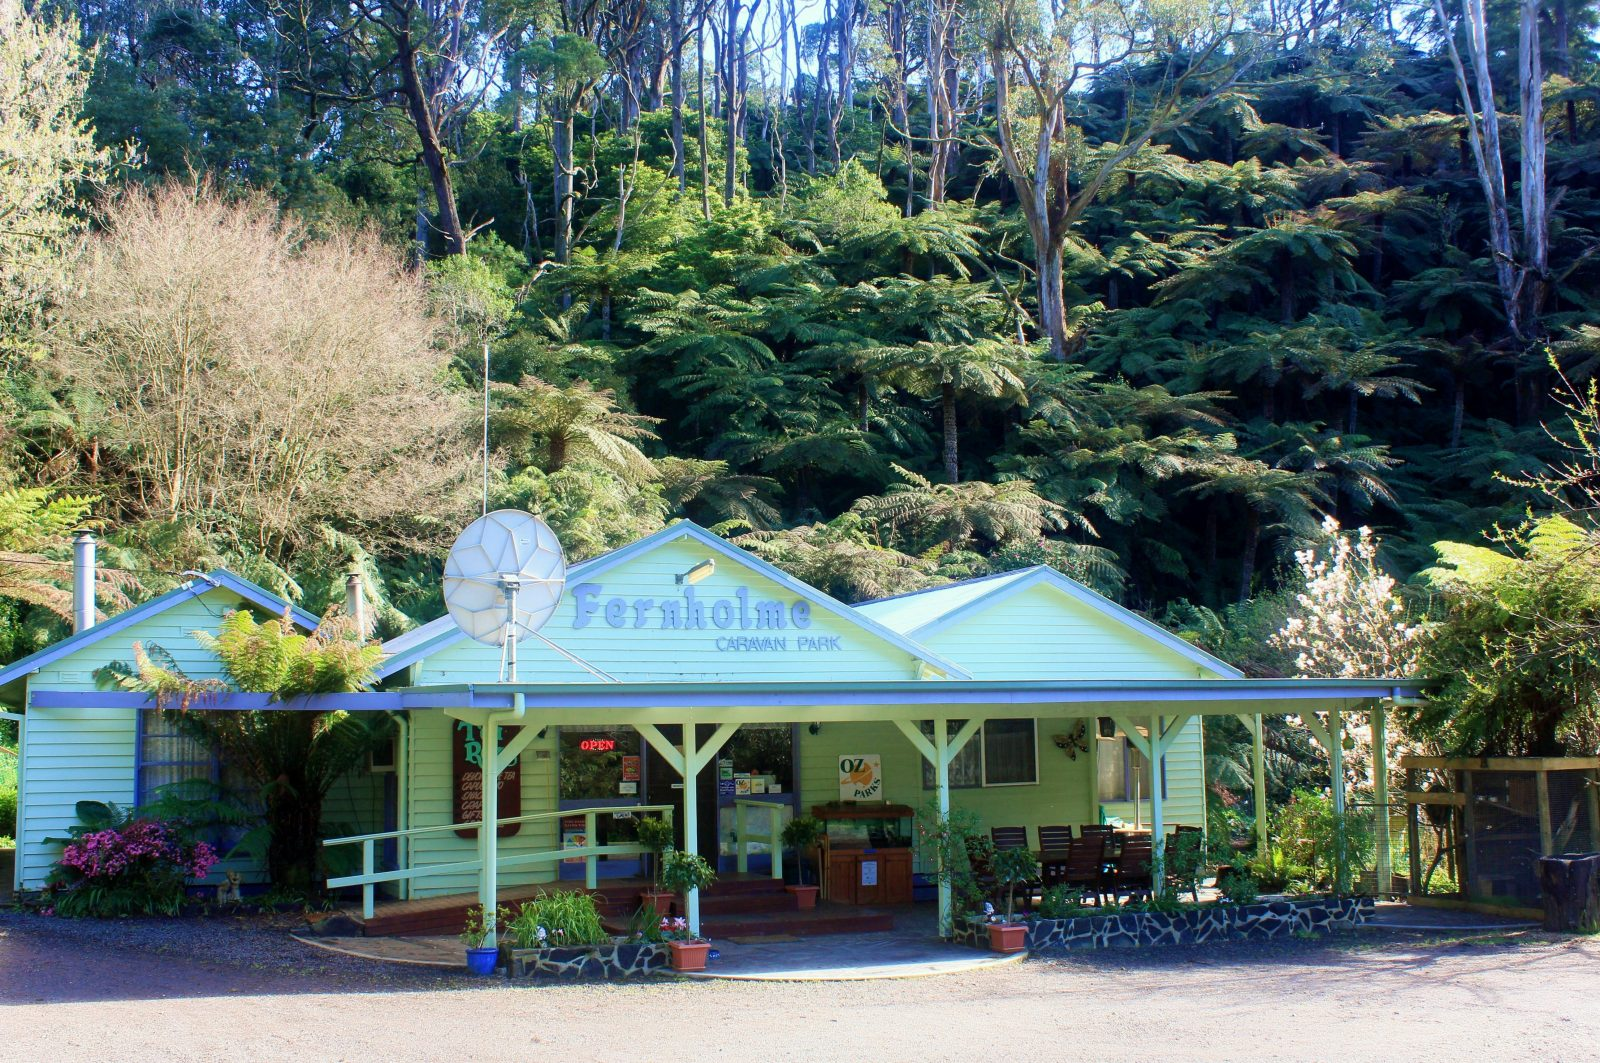 Tarra Valley Caravan Park Fernholme